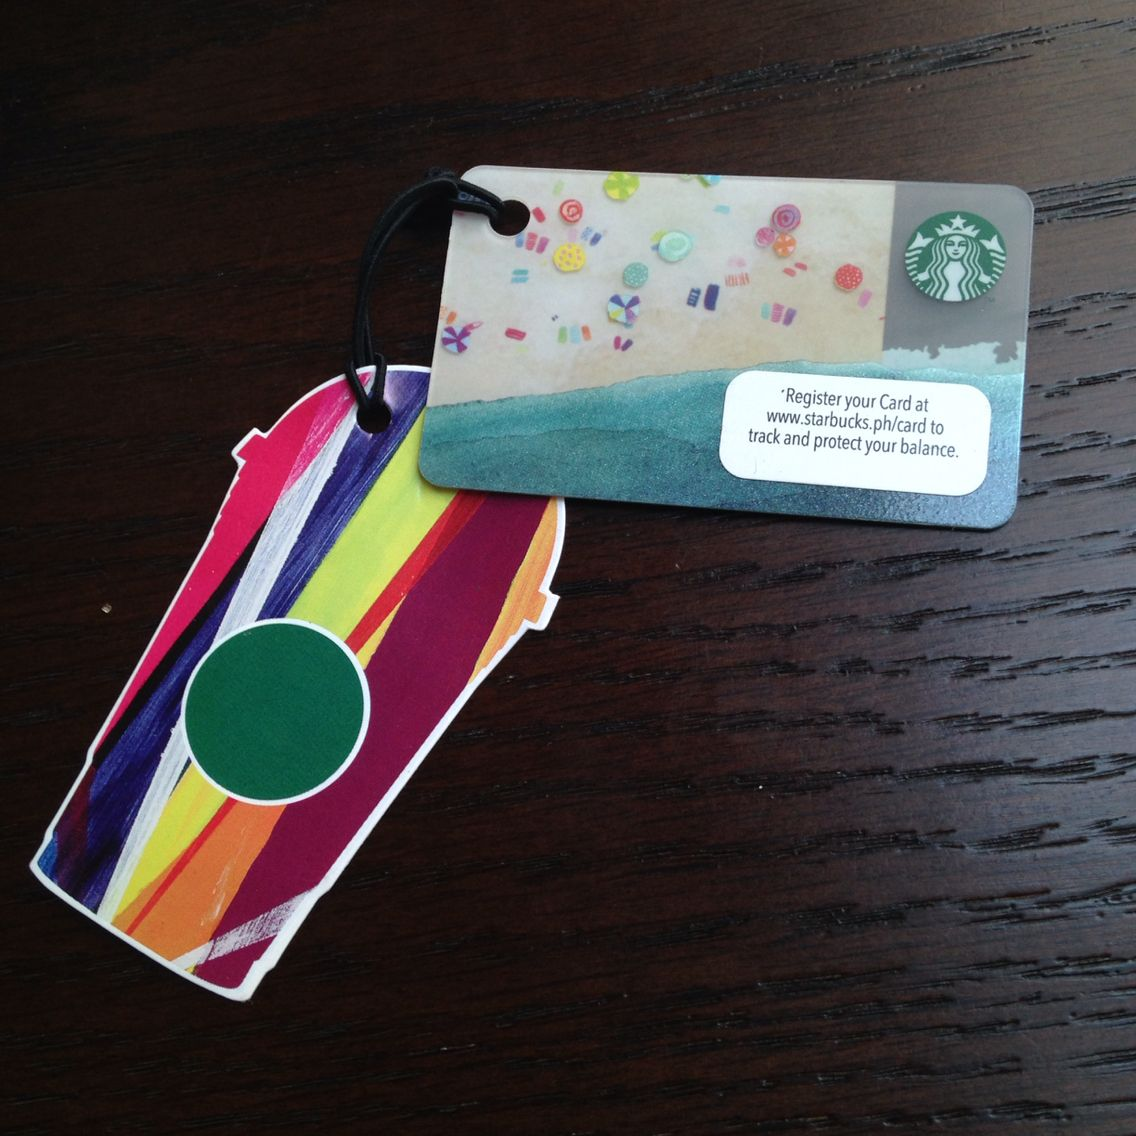 Starbucks Philippines Summer Mini Card (2015)